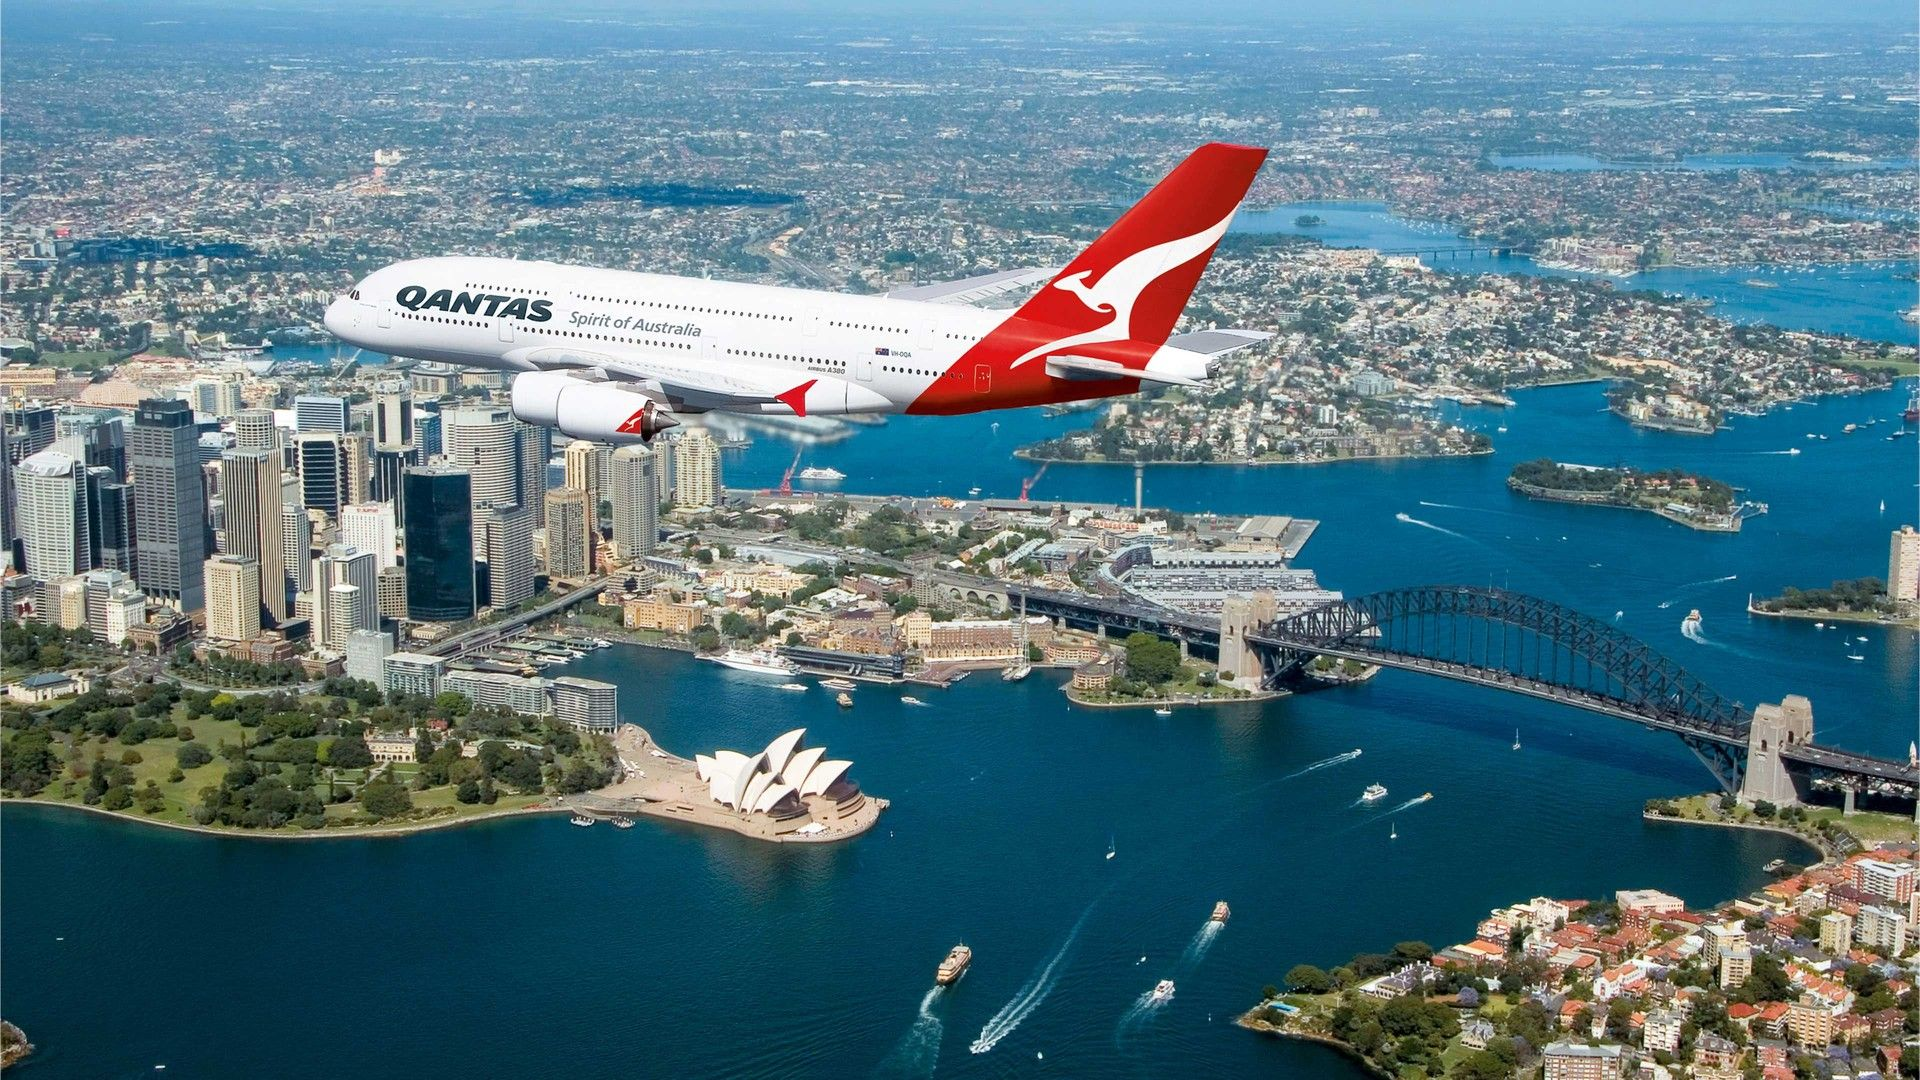 Qantas Airlines flying over Australia.